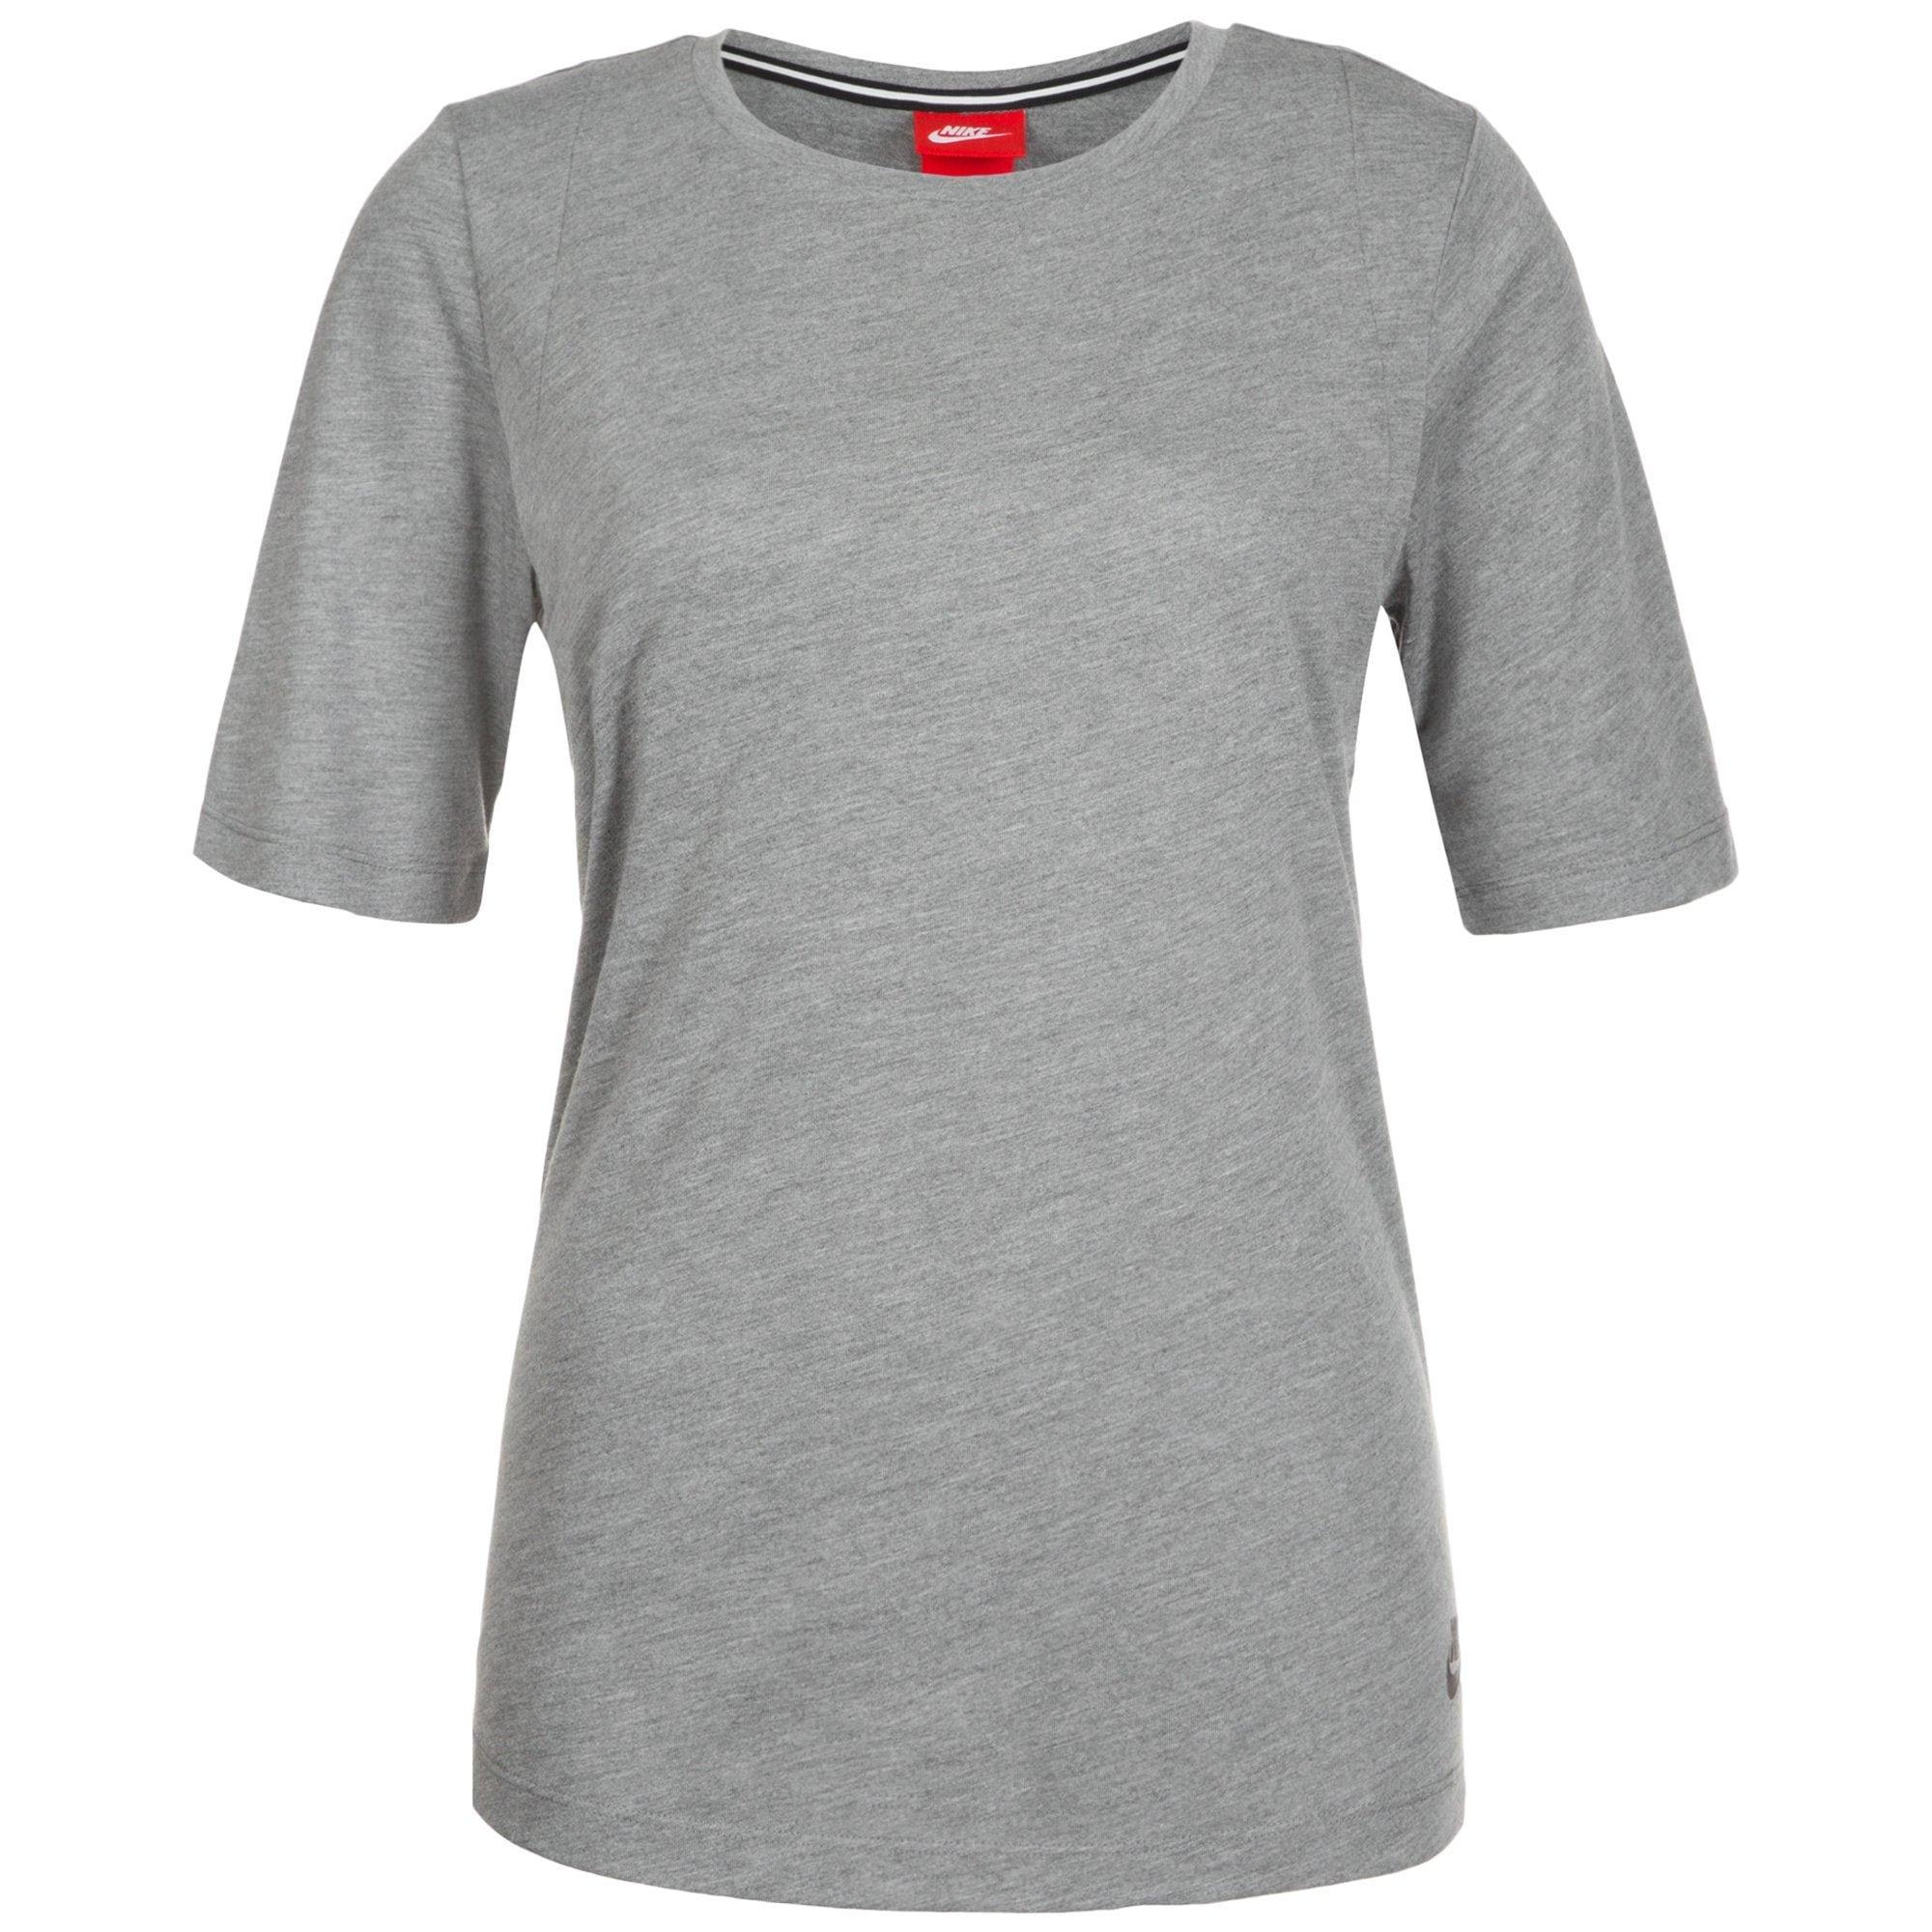 Nike Sportswear Essential T-Shirt Damen